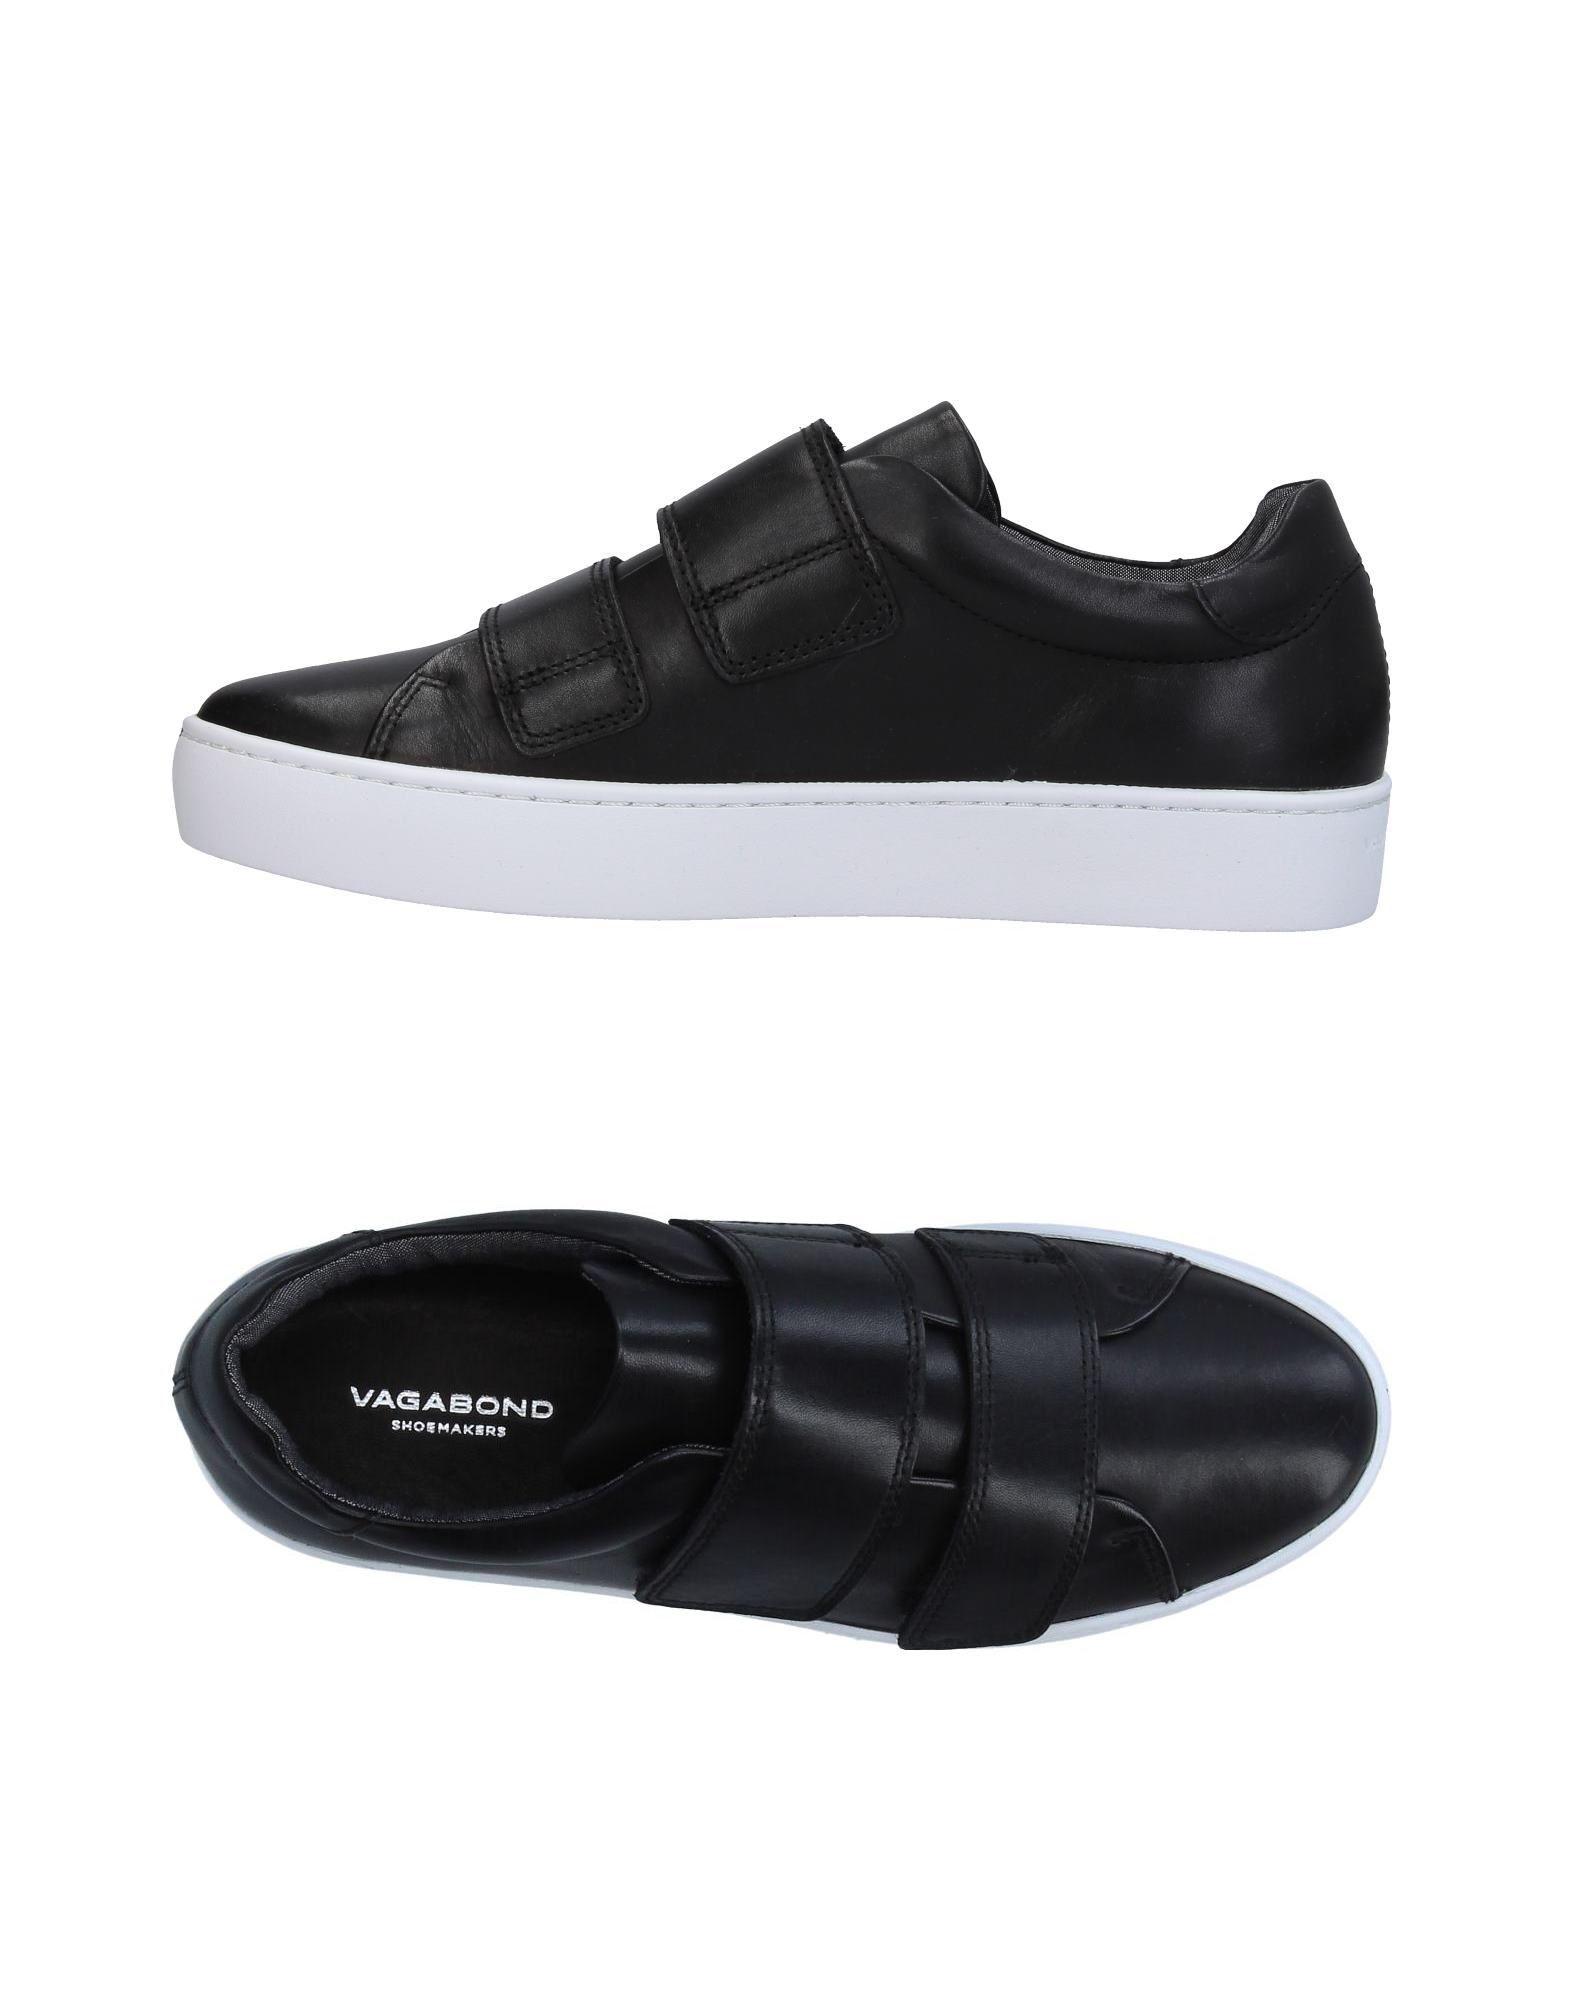 VAGABOND SHOEMAKERS Низкие кеды и кроссовки vagabond shoemakers низкие кеды и кроссовки